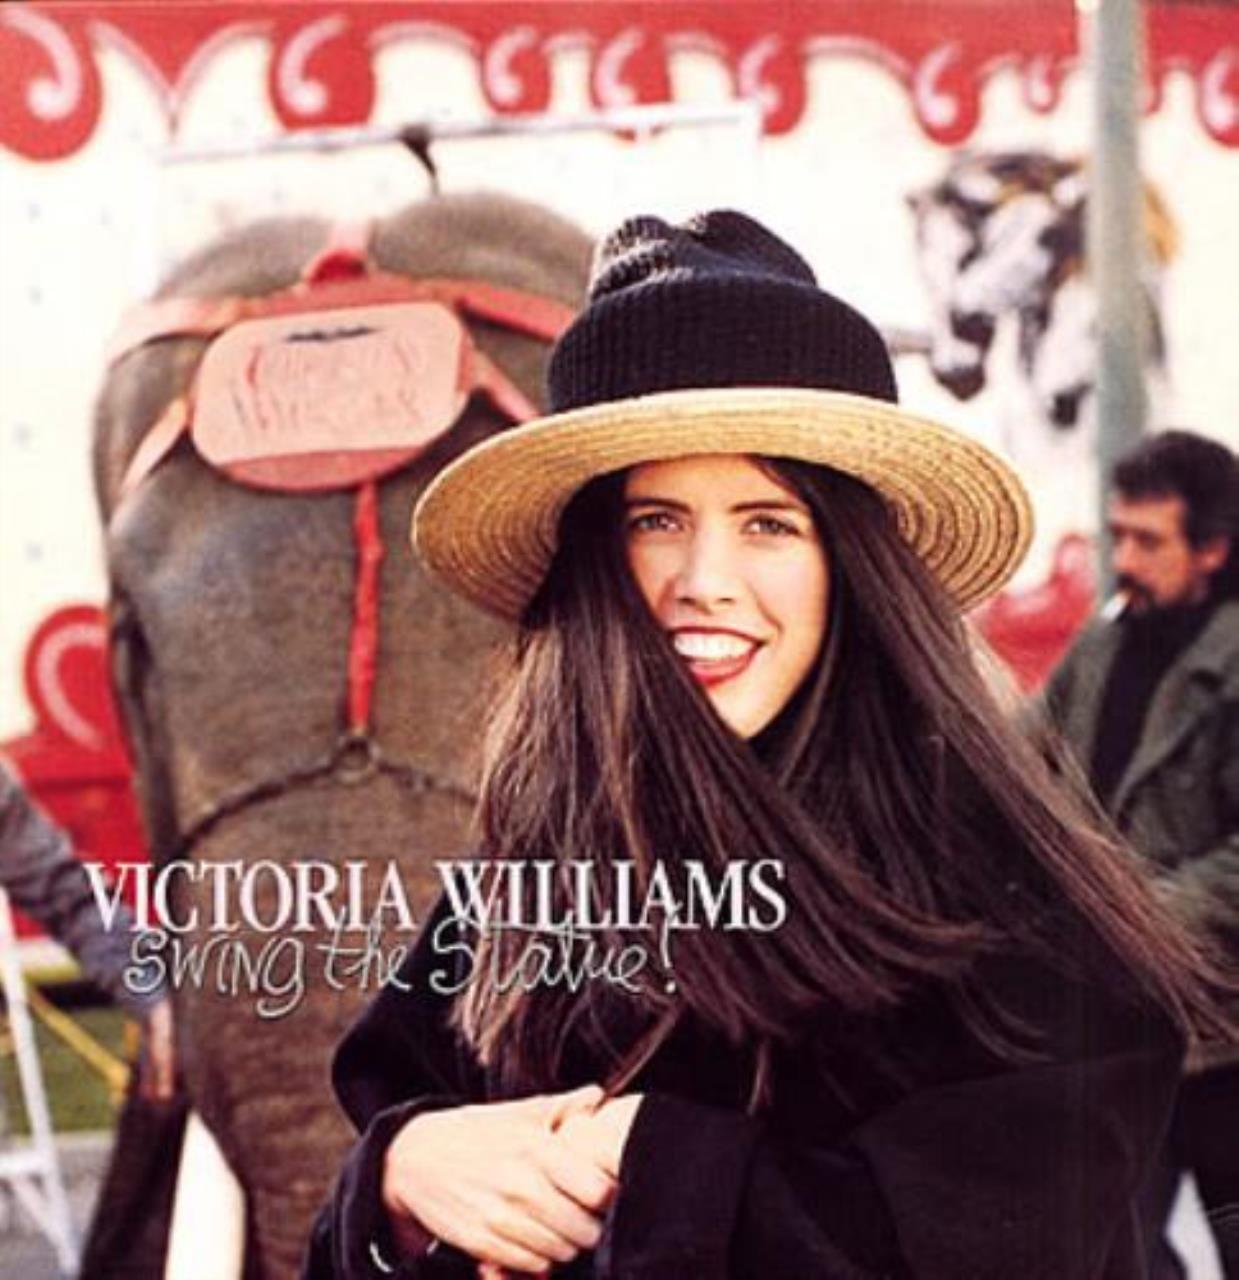 Victoria Williams - Swing The Statue (1994) [FLAC] Download